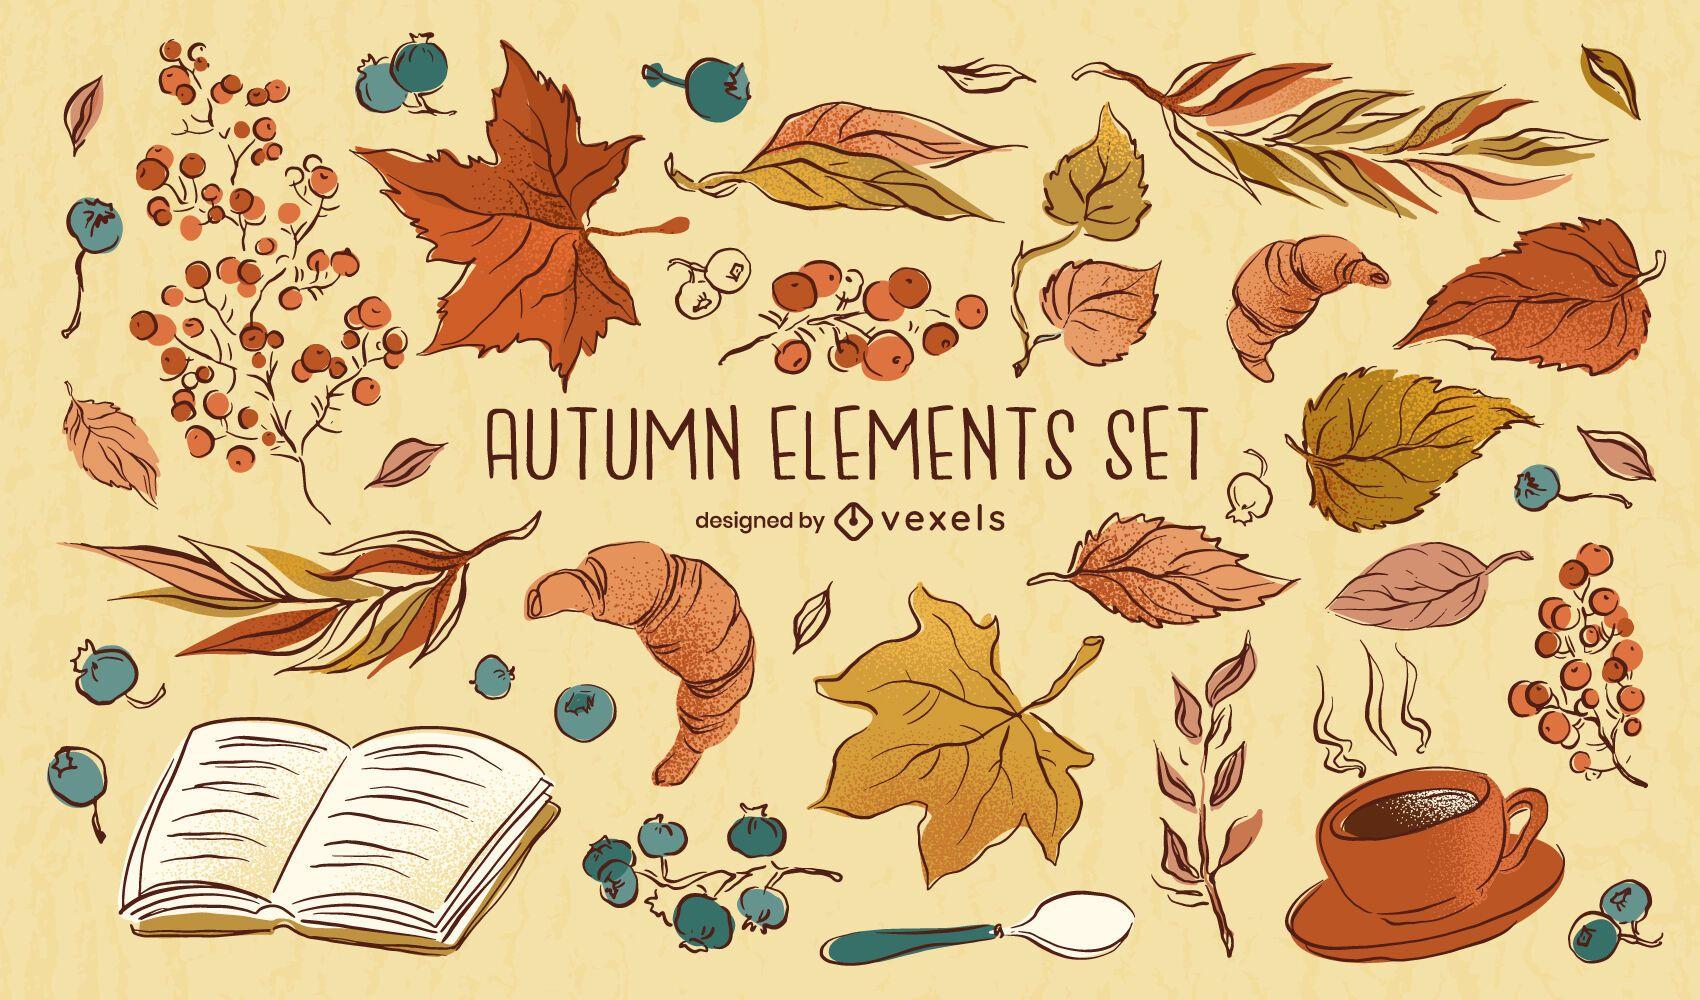 Autumn Elements Drawing Set